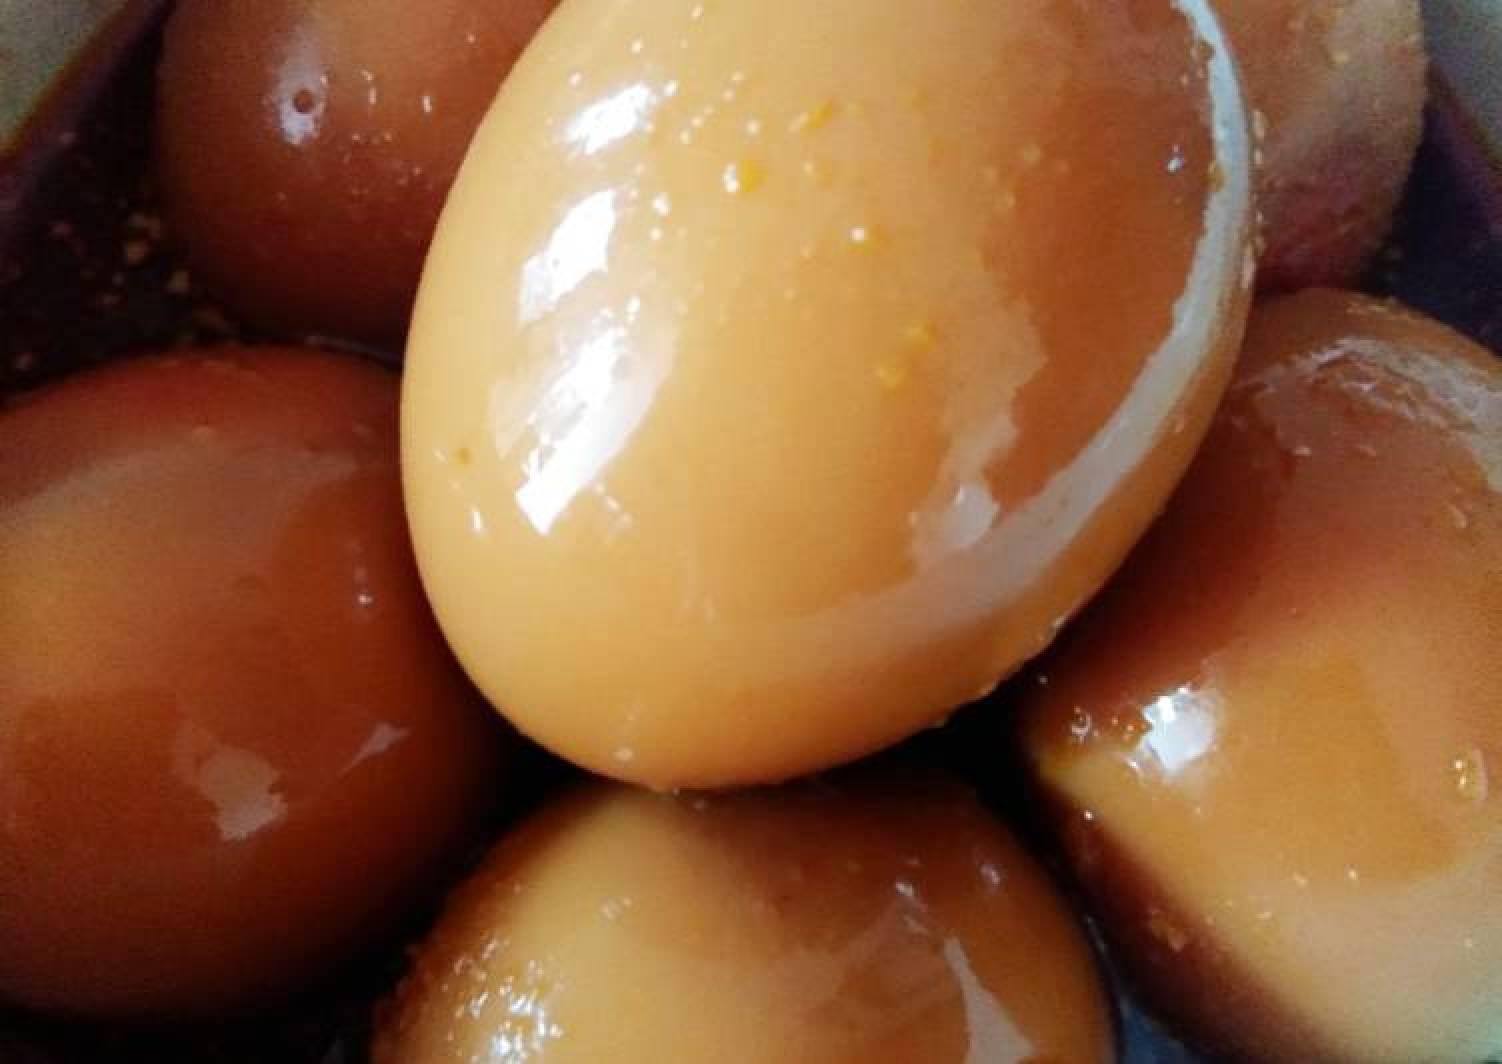 Olahan Telur Pindang Coklat Cara Membuat Telur Pindang Coklat Yang Sedap Resepmasakan